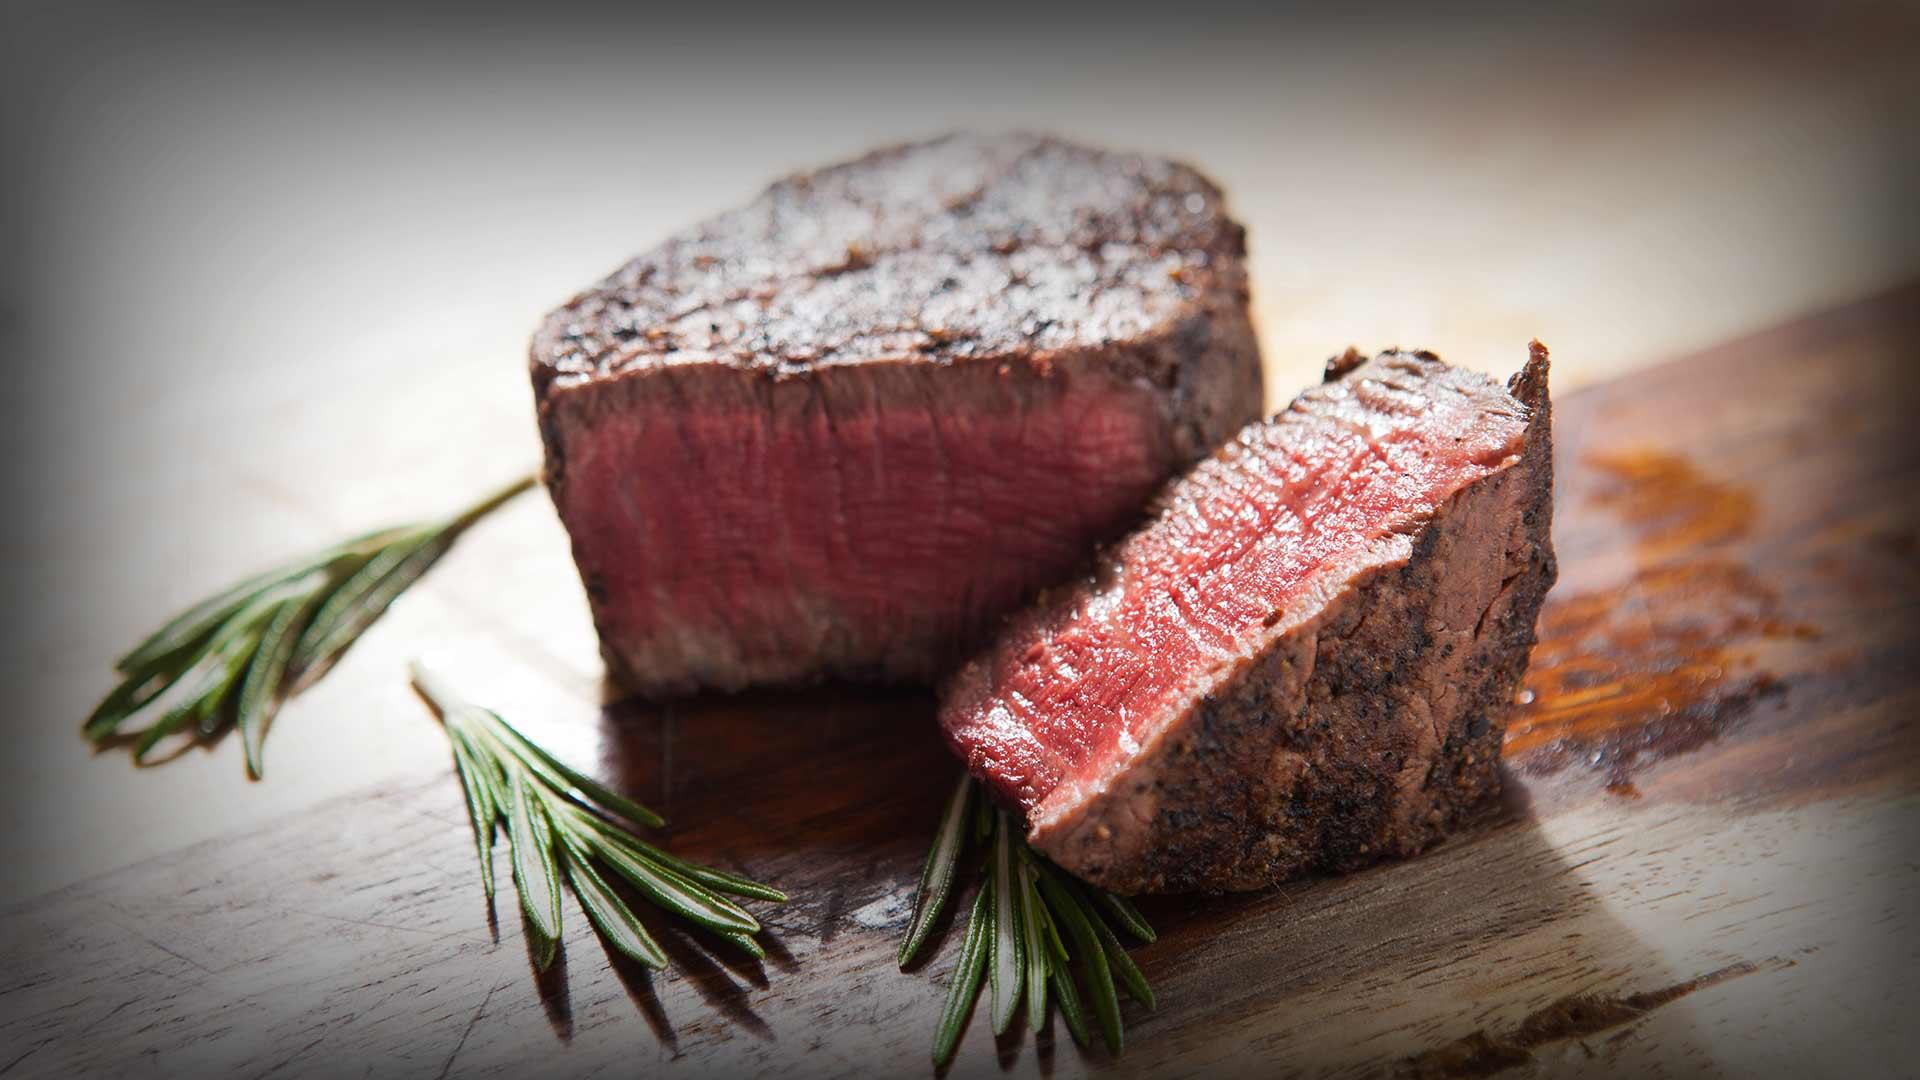 continental restaurant steaks cut